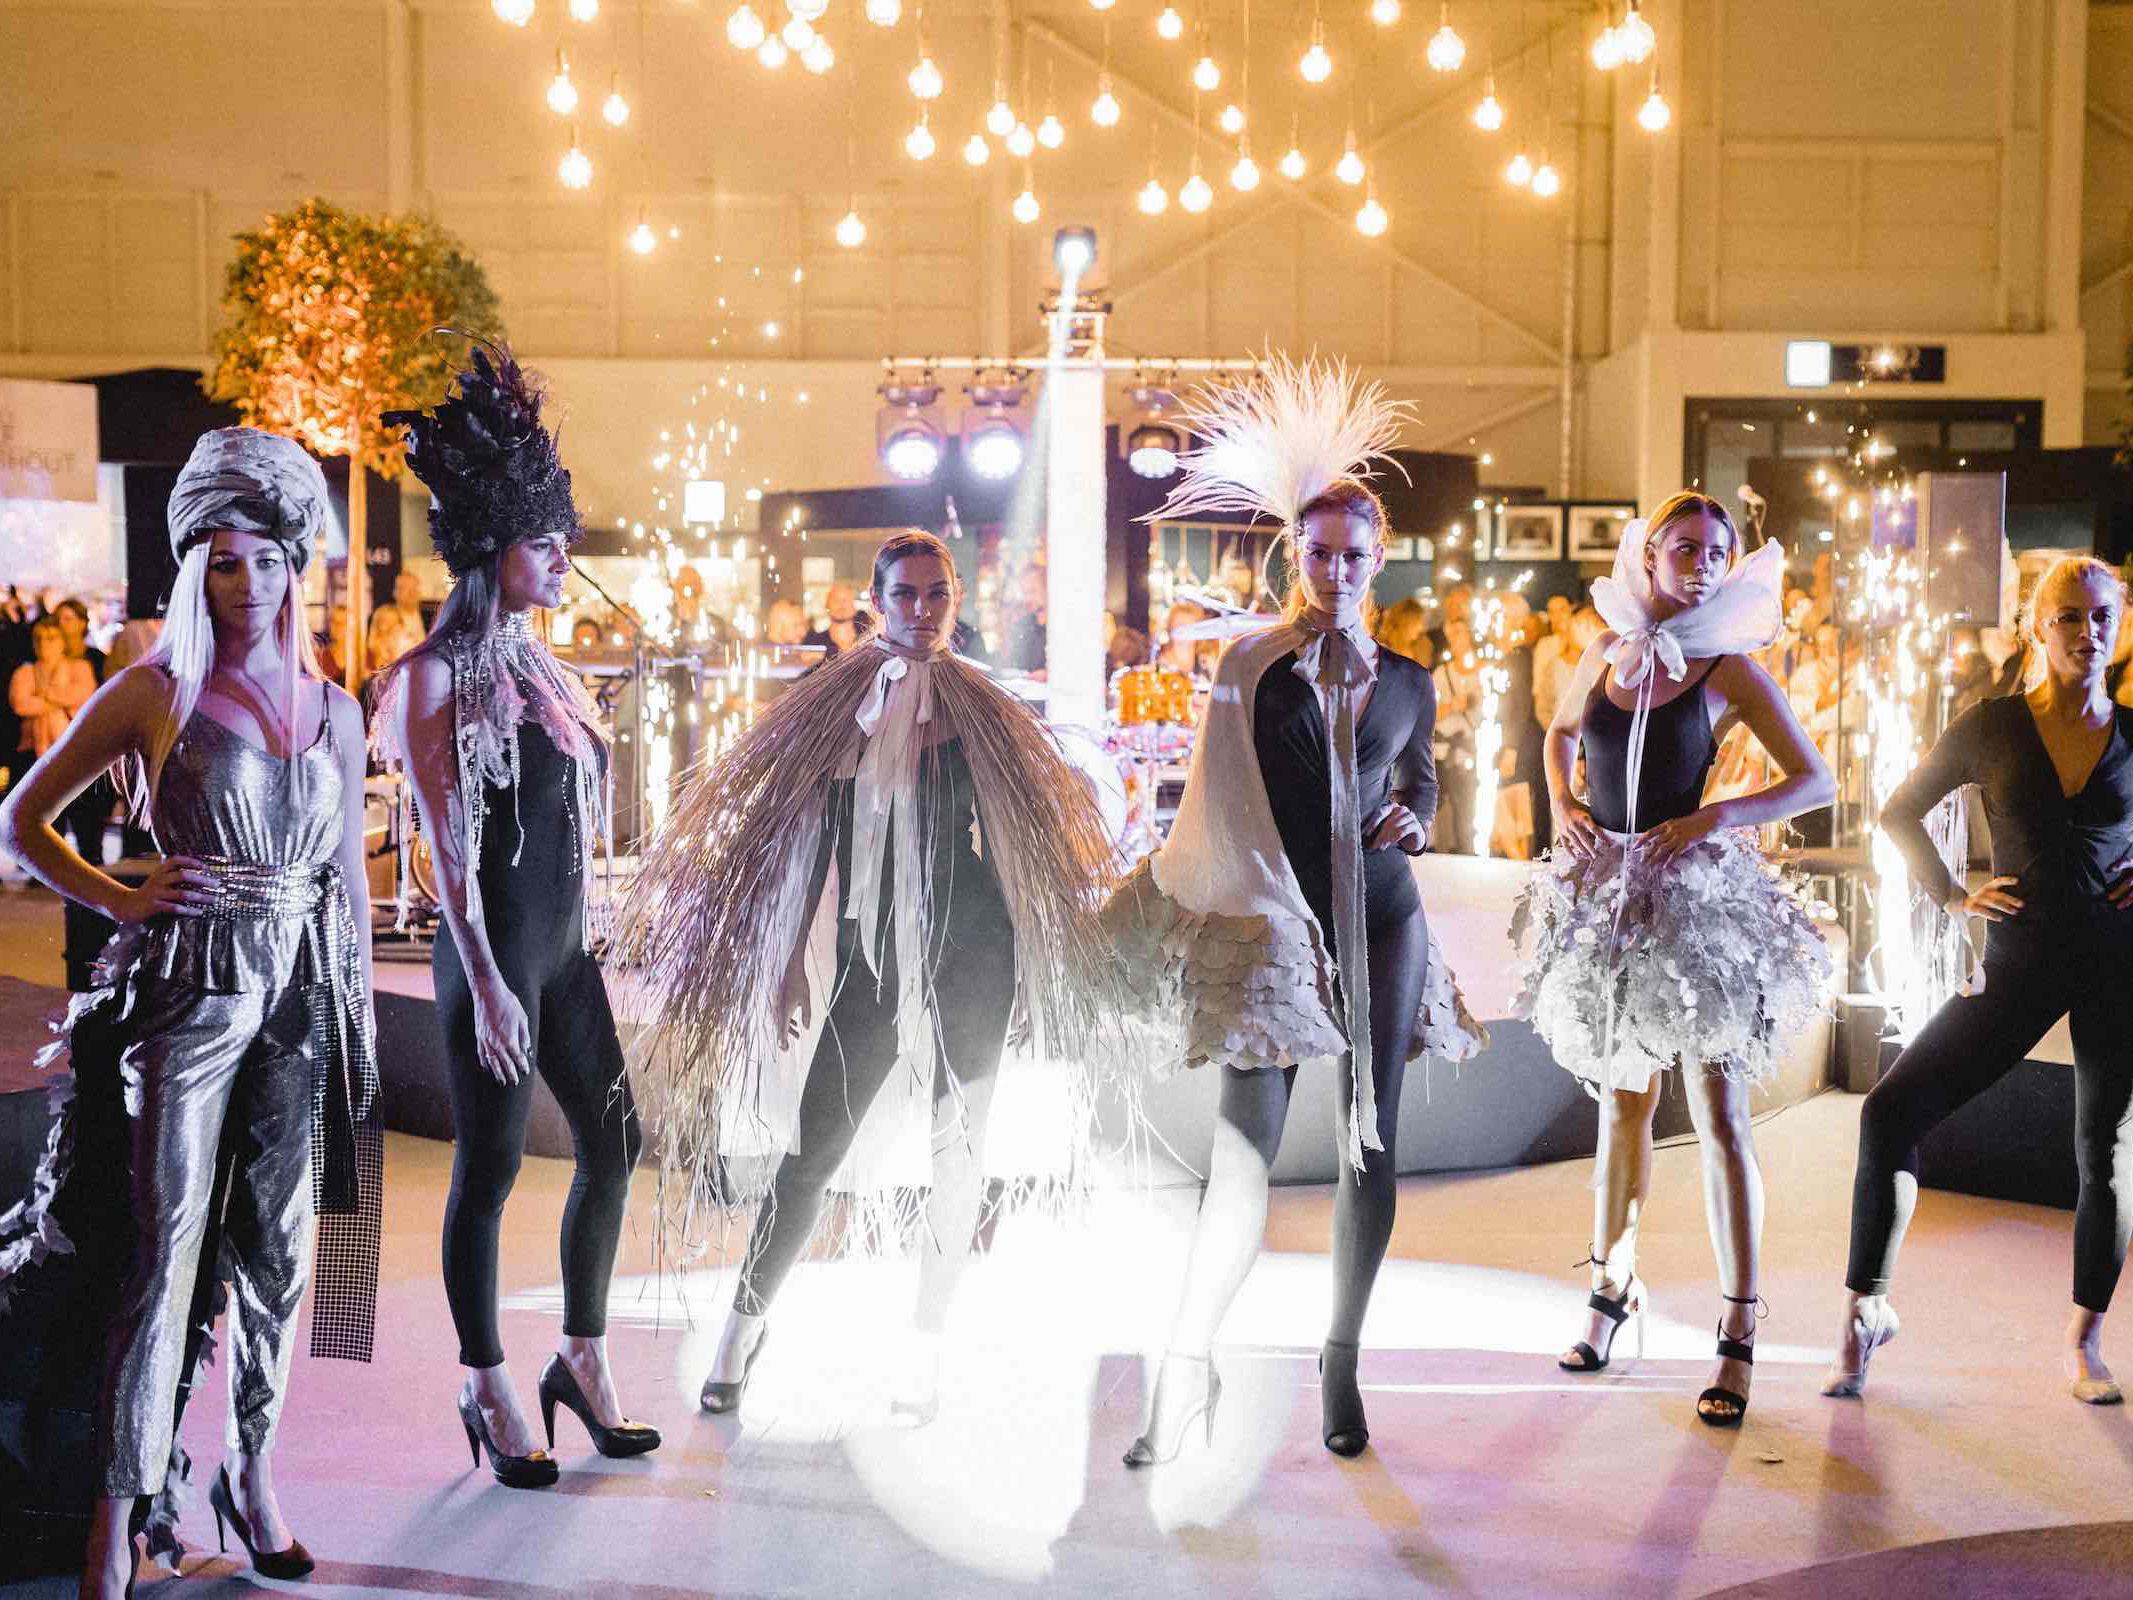 Eventplanung   Eventausstatung   Hannover   Kongresse   Shows   Galas   Modenschauen   Produktpräsentationen   Bühnen   Licht   Tontechnik   Veranstaltungslogistik   Catering   Programmgestaltung   Künstler